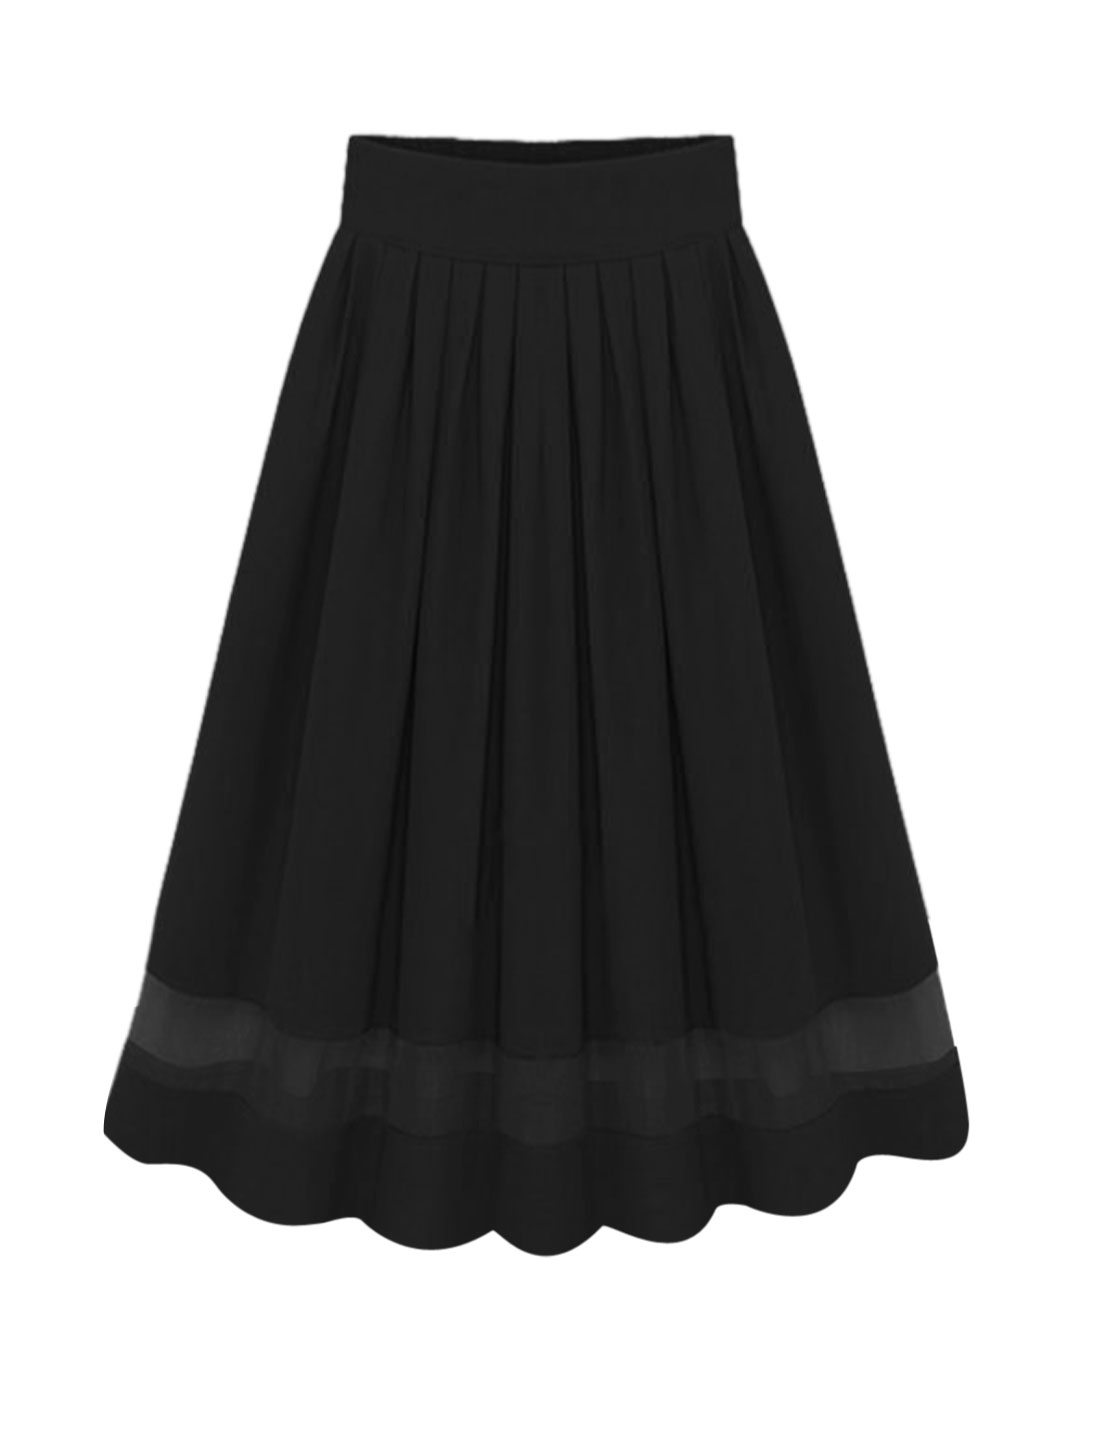 Woman Organza Panel Half Lined Pleated Detail High Waist Chiffon Skirt Black M